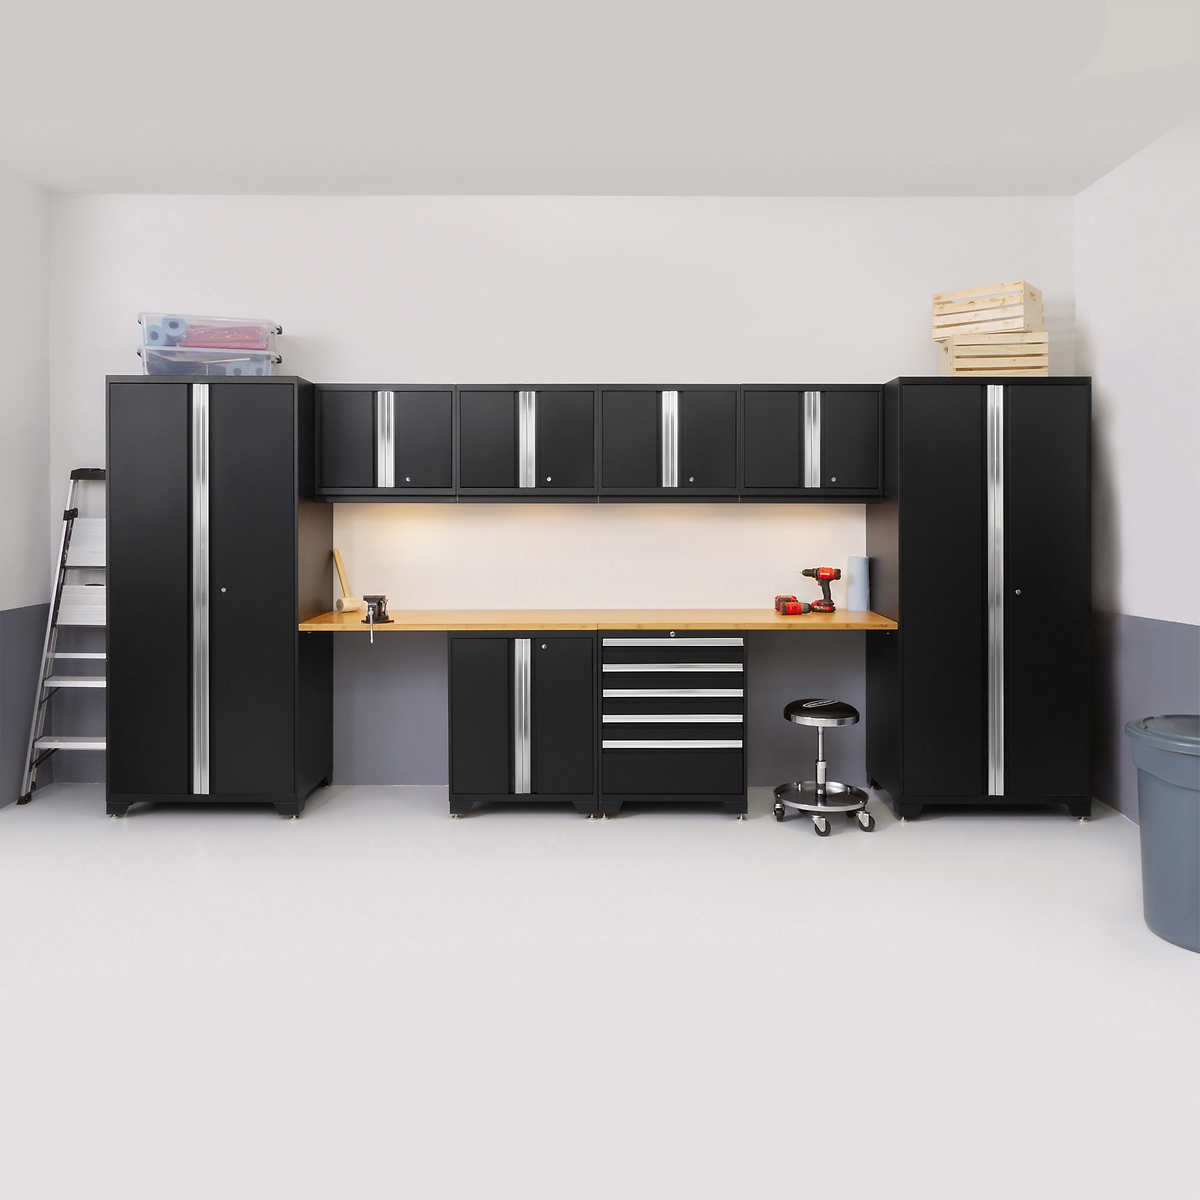 Newage Garage Cabinets Costco : Newage cabinets costco matttroy